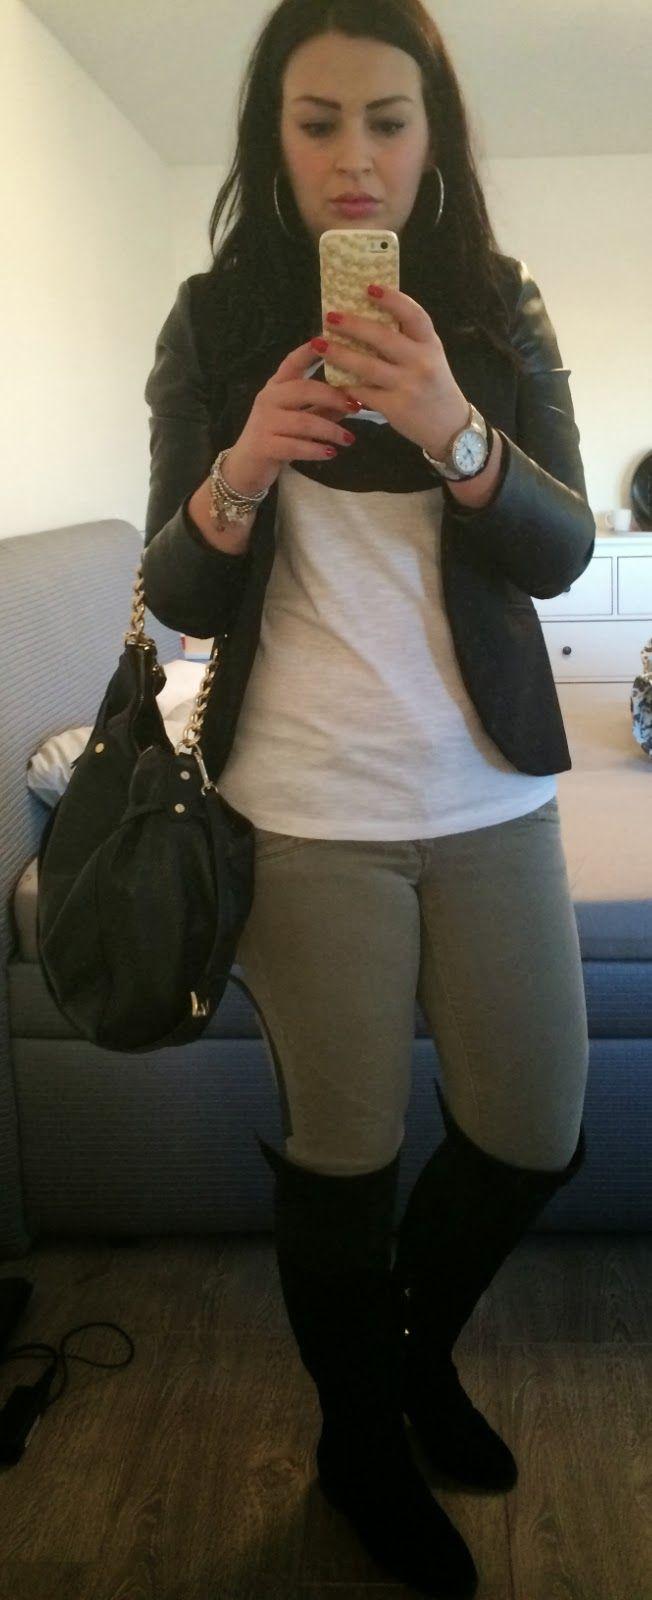 #6 t-shirt Reserved khaki trousers H&M jacket with PU sleeve Primark handbag Michael Kors boots Stradivarius earrings Primark watches Michael Kors sunglasses Lee Cooper multicolor bracelets (present from my mum)